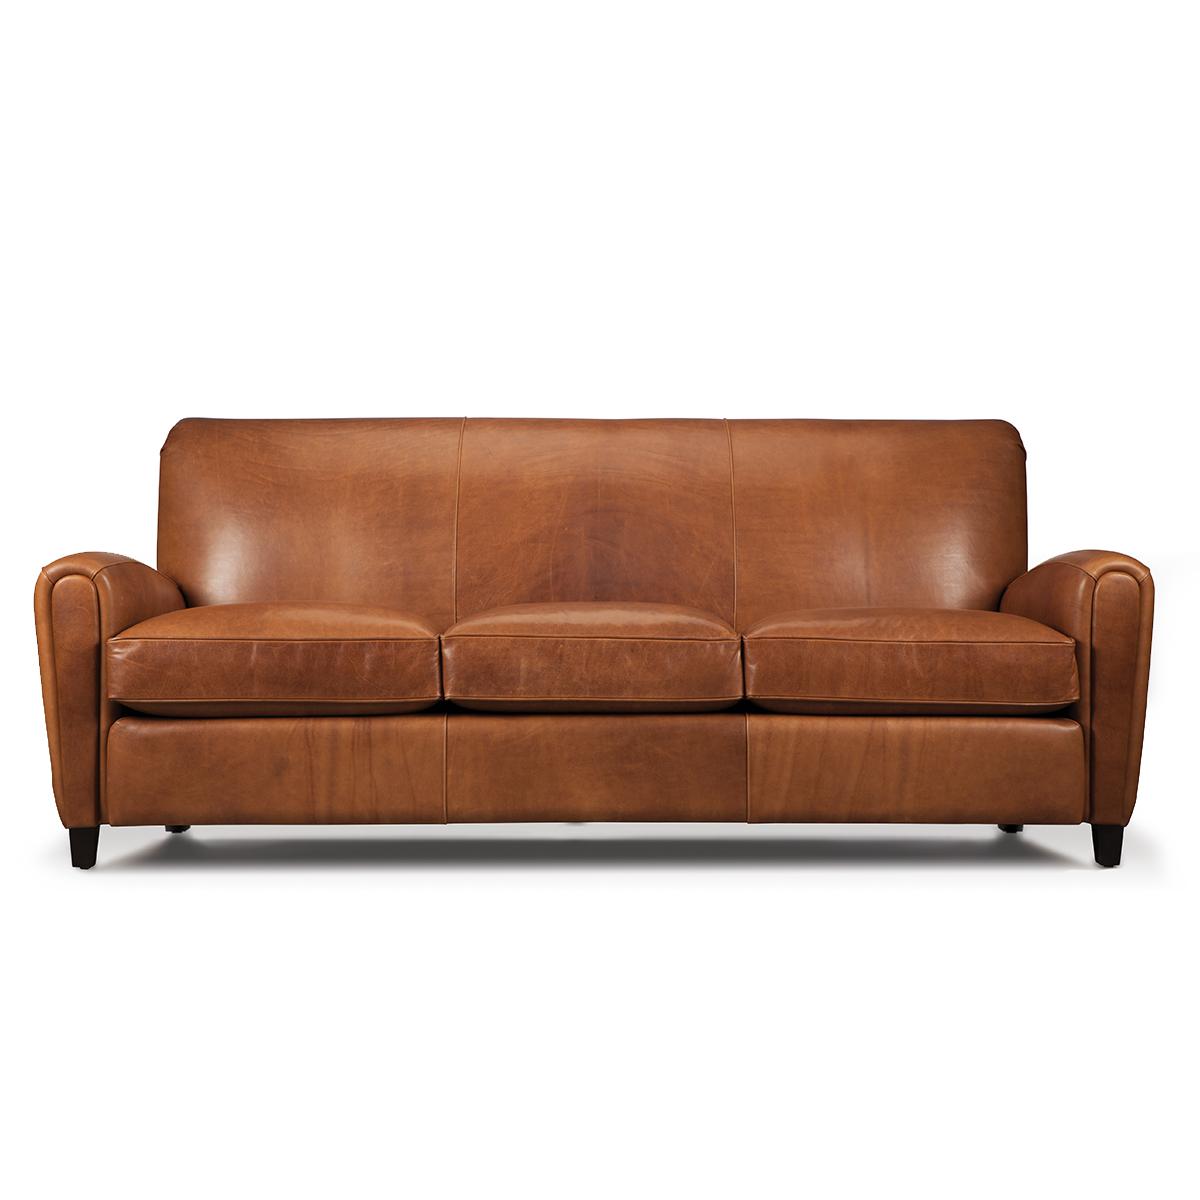 Traynham Sofa